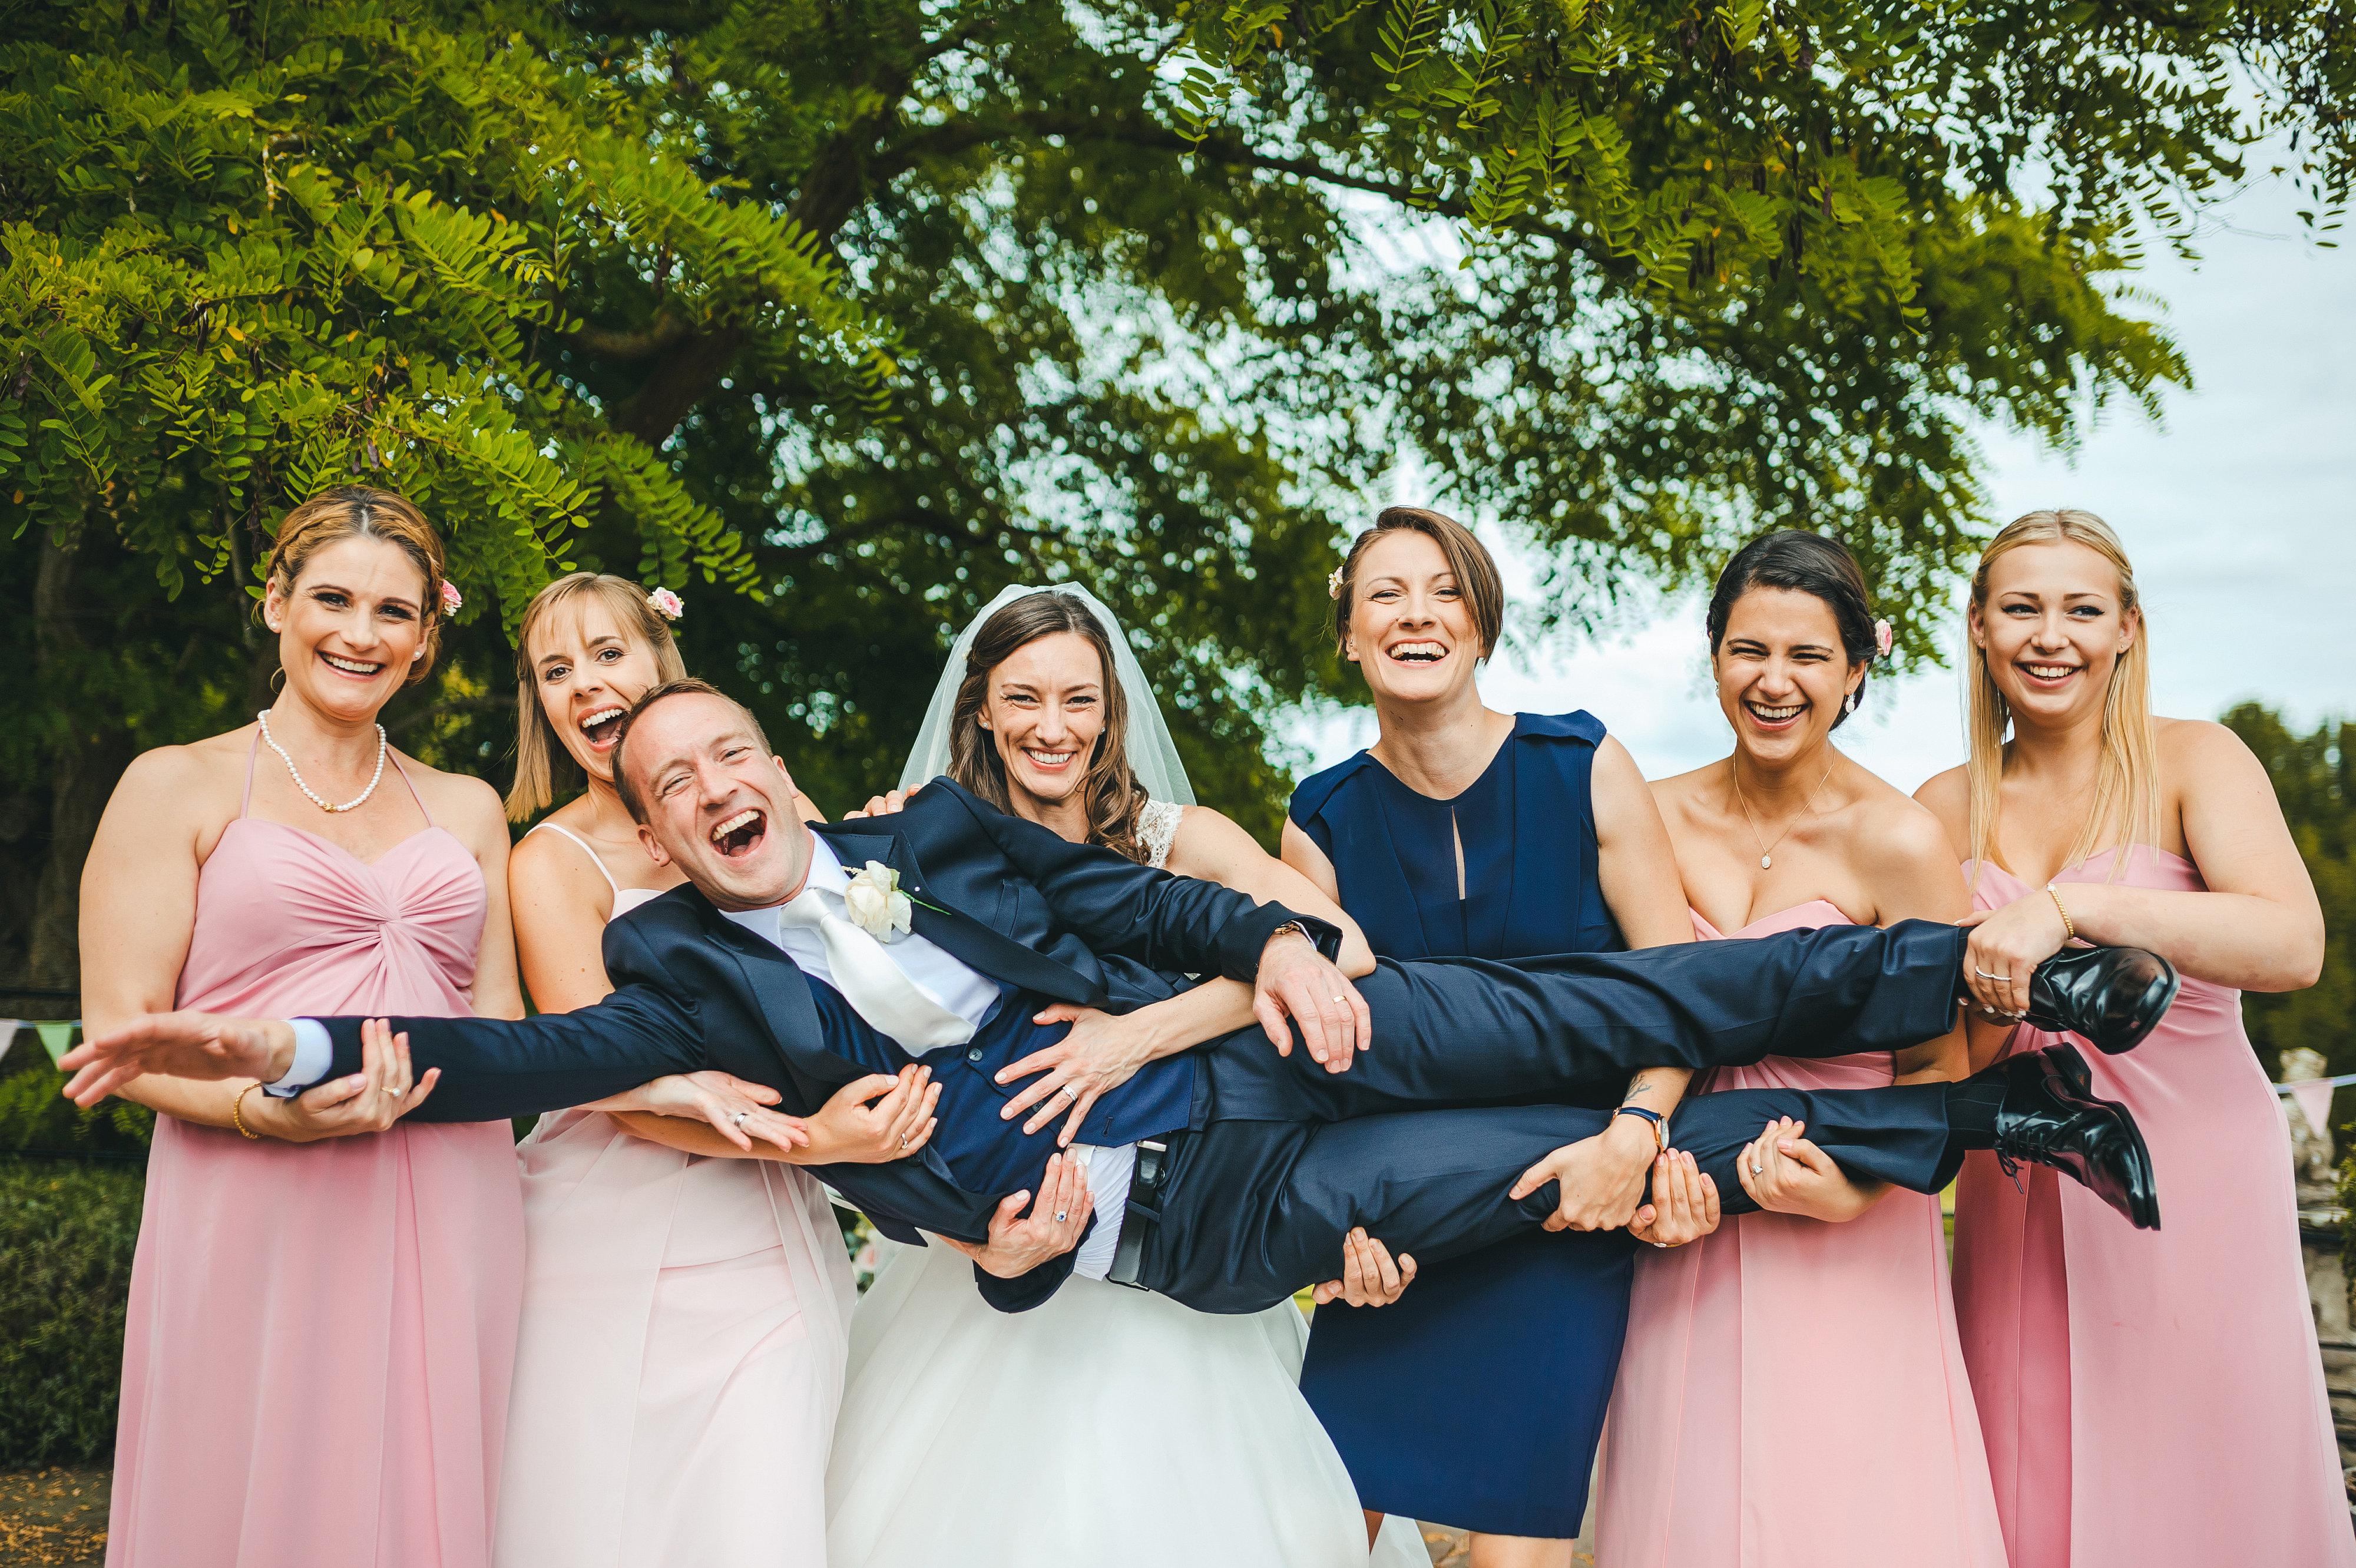 Helen & Andrew 7 designer wedding dresses by Caroline Castigliano